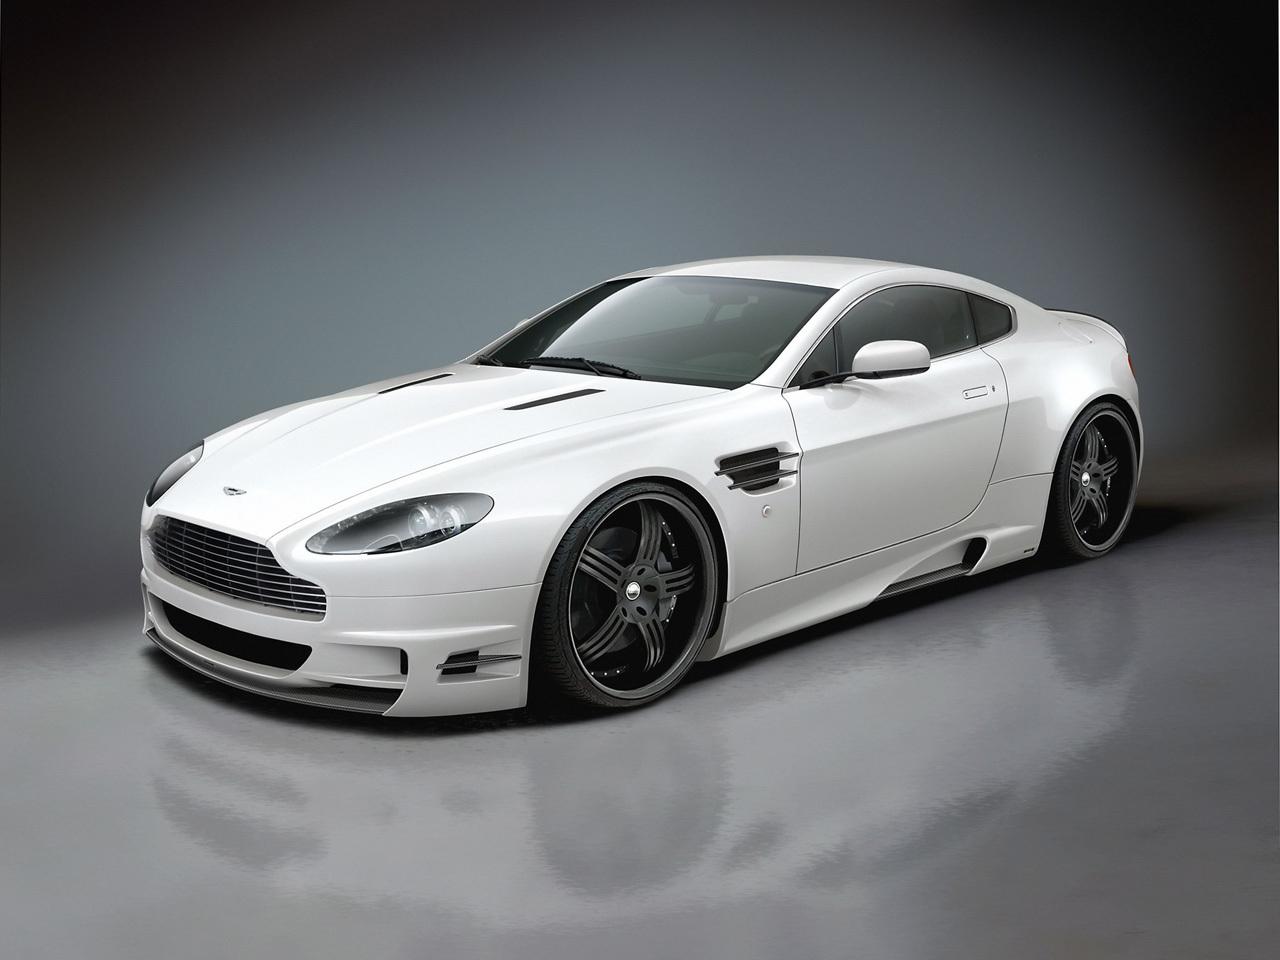 Aston-Martin-aston-martin-4300418-1280-960-1-